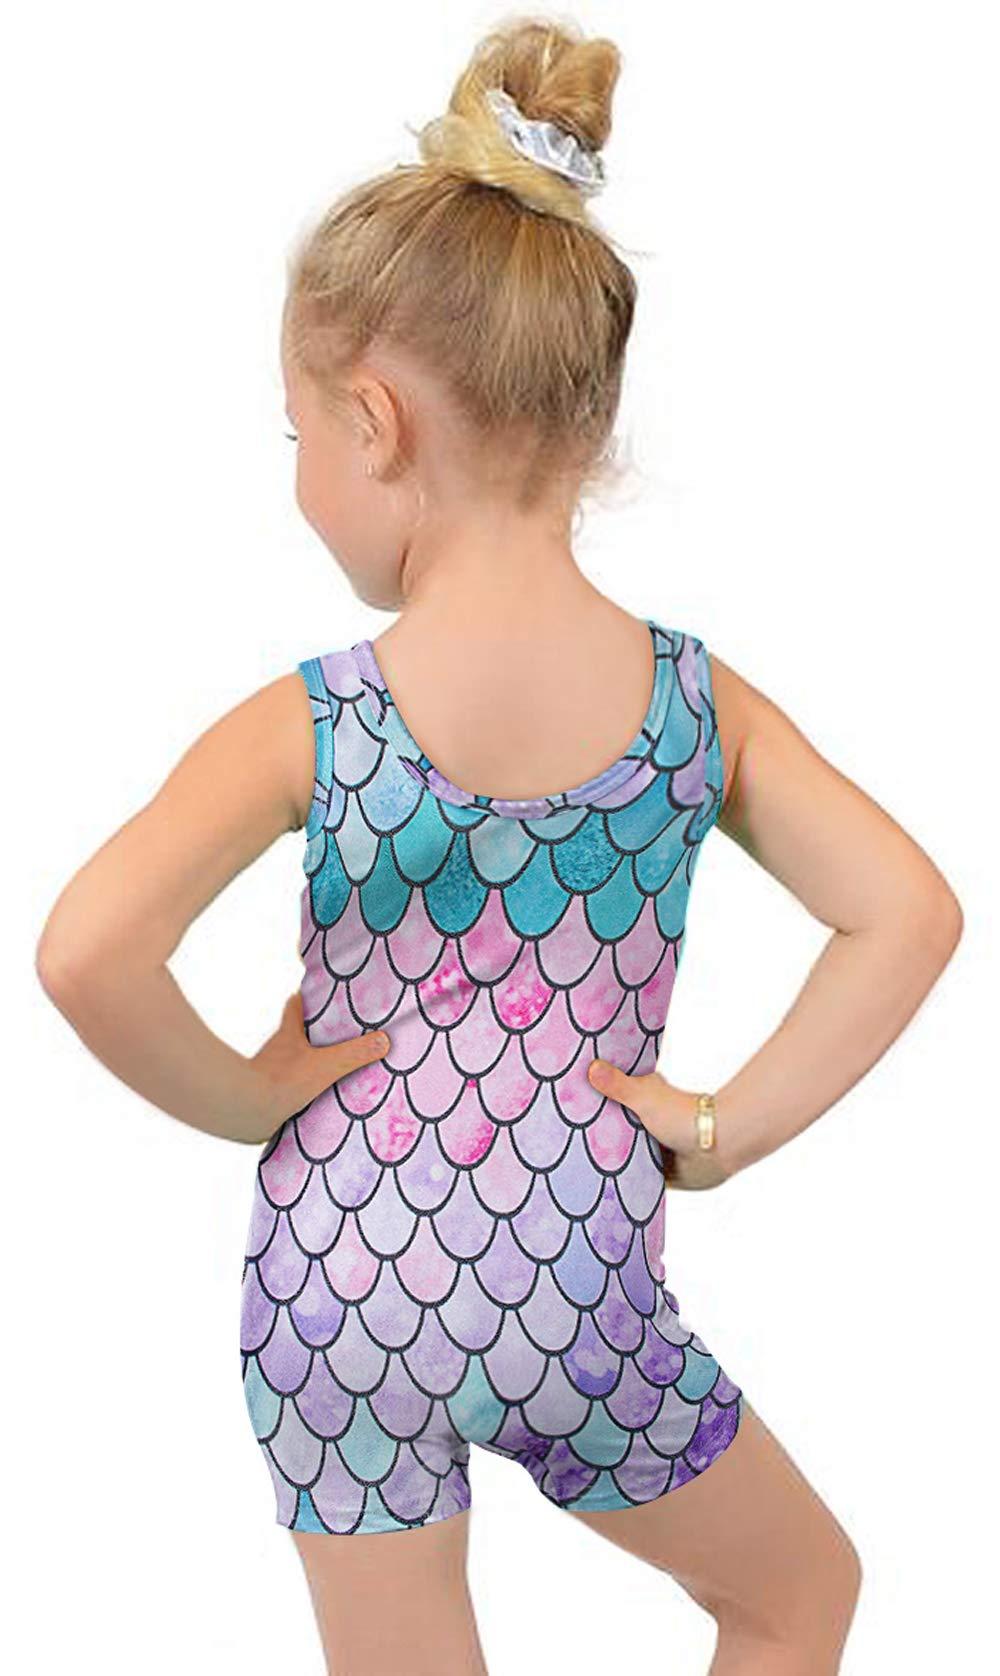 Toddler Girls Sparkly Leotards Green Pink Purple Mermaid Fish Scale 3t 4t Sleeveless Dancewear Clothes with Shorts Style Gymnastics Unitard Biketard for Kindergarten School